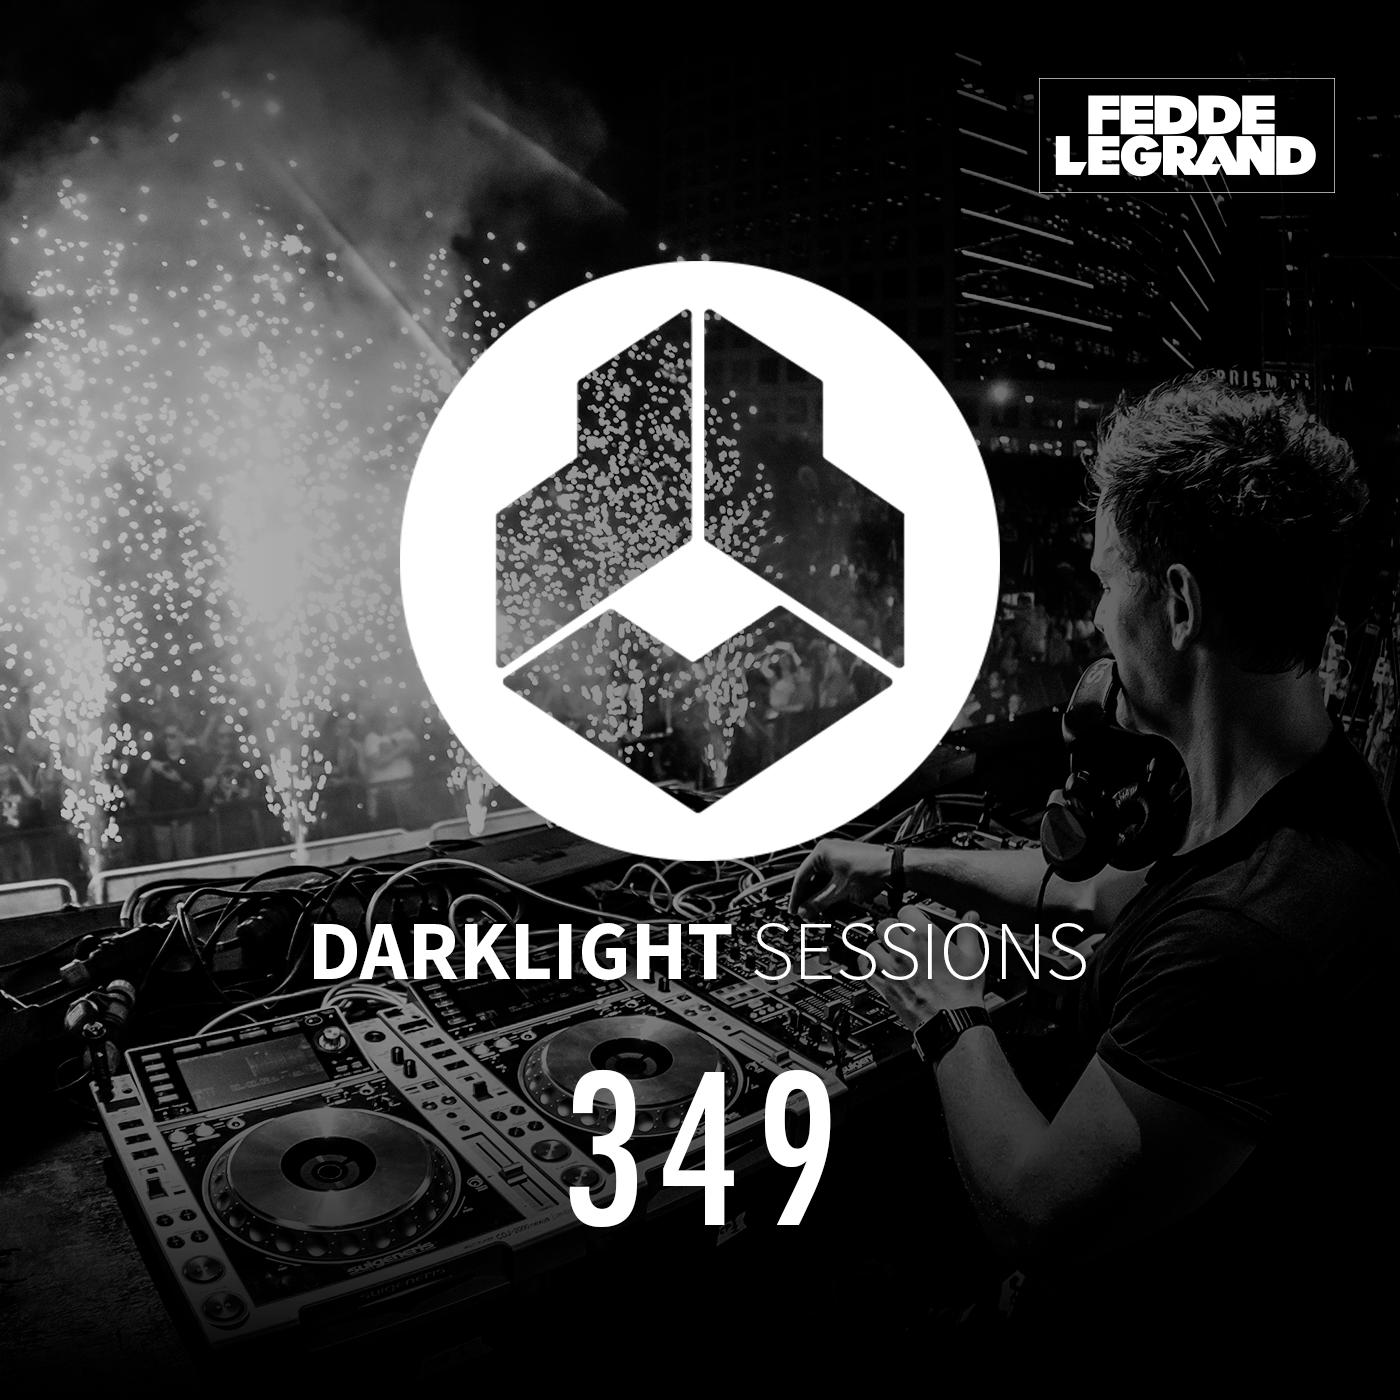 Darklight Sessions 349